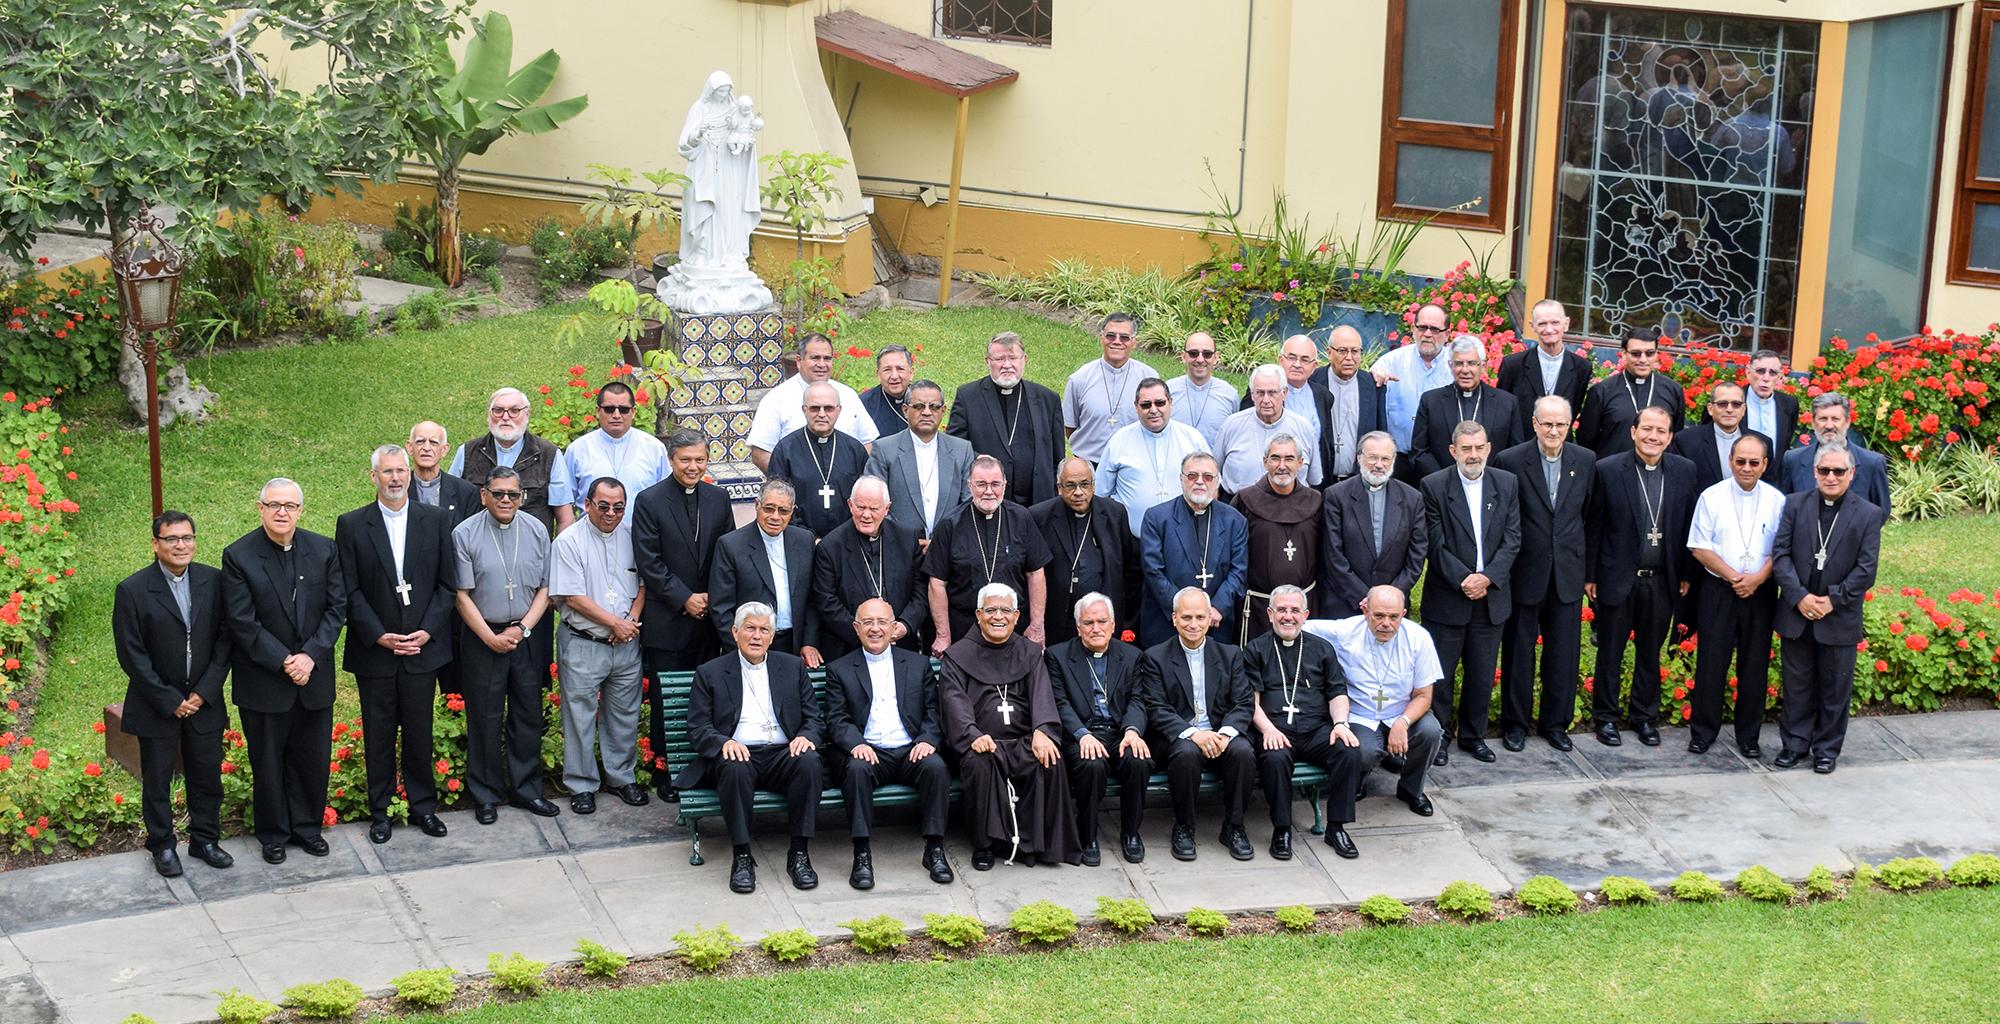 Obispos de Perú © Conferencia Episcopal Peruana